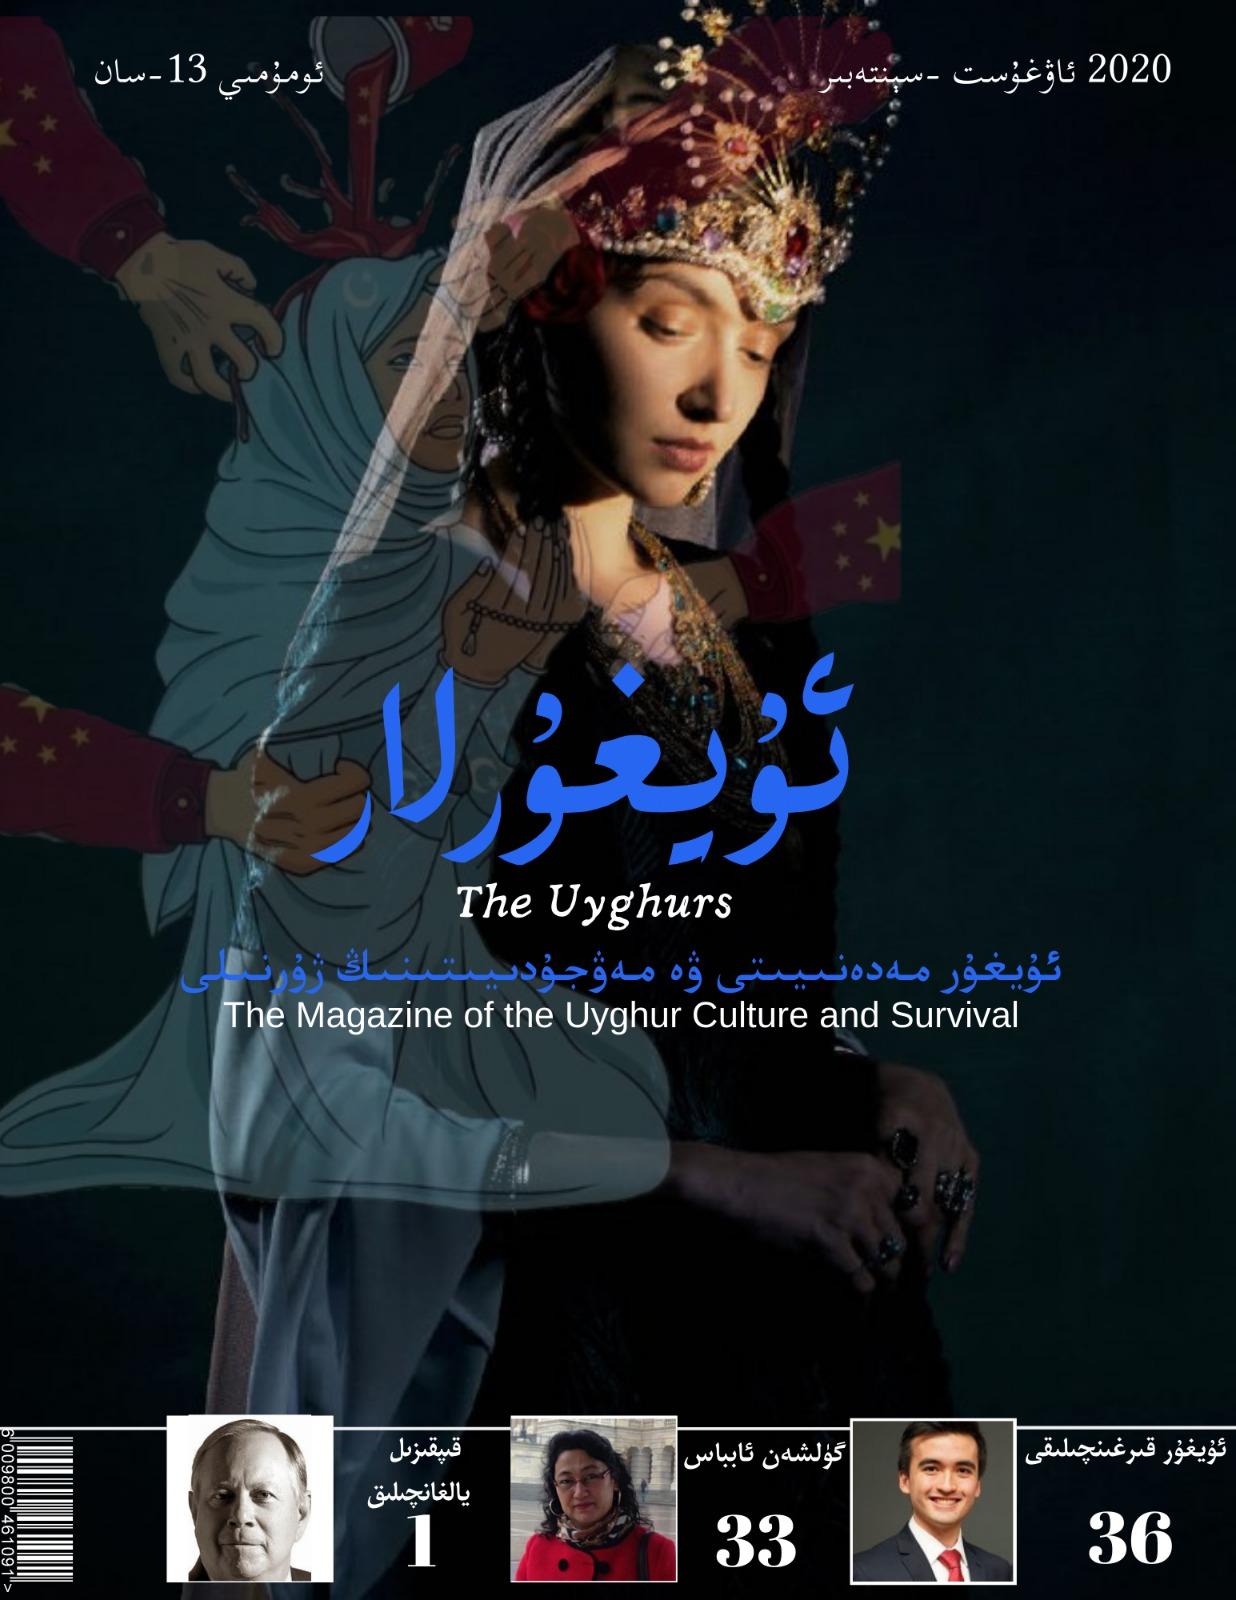 Uyghur13 - ئۇيغۇرلار 2020-يىلى 13-سان